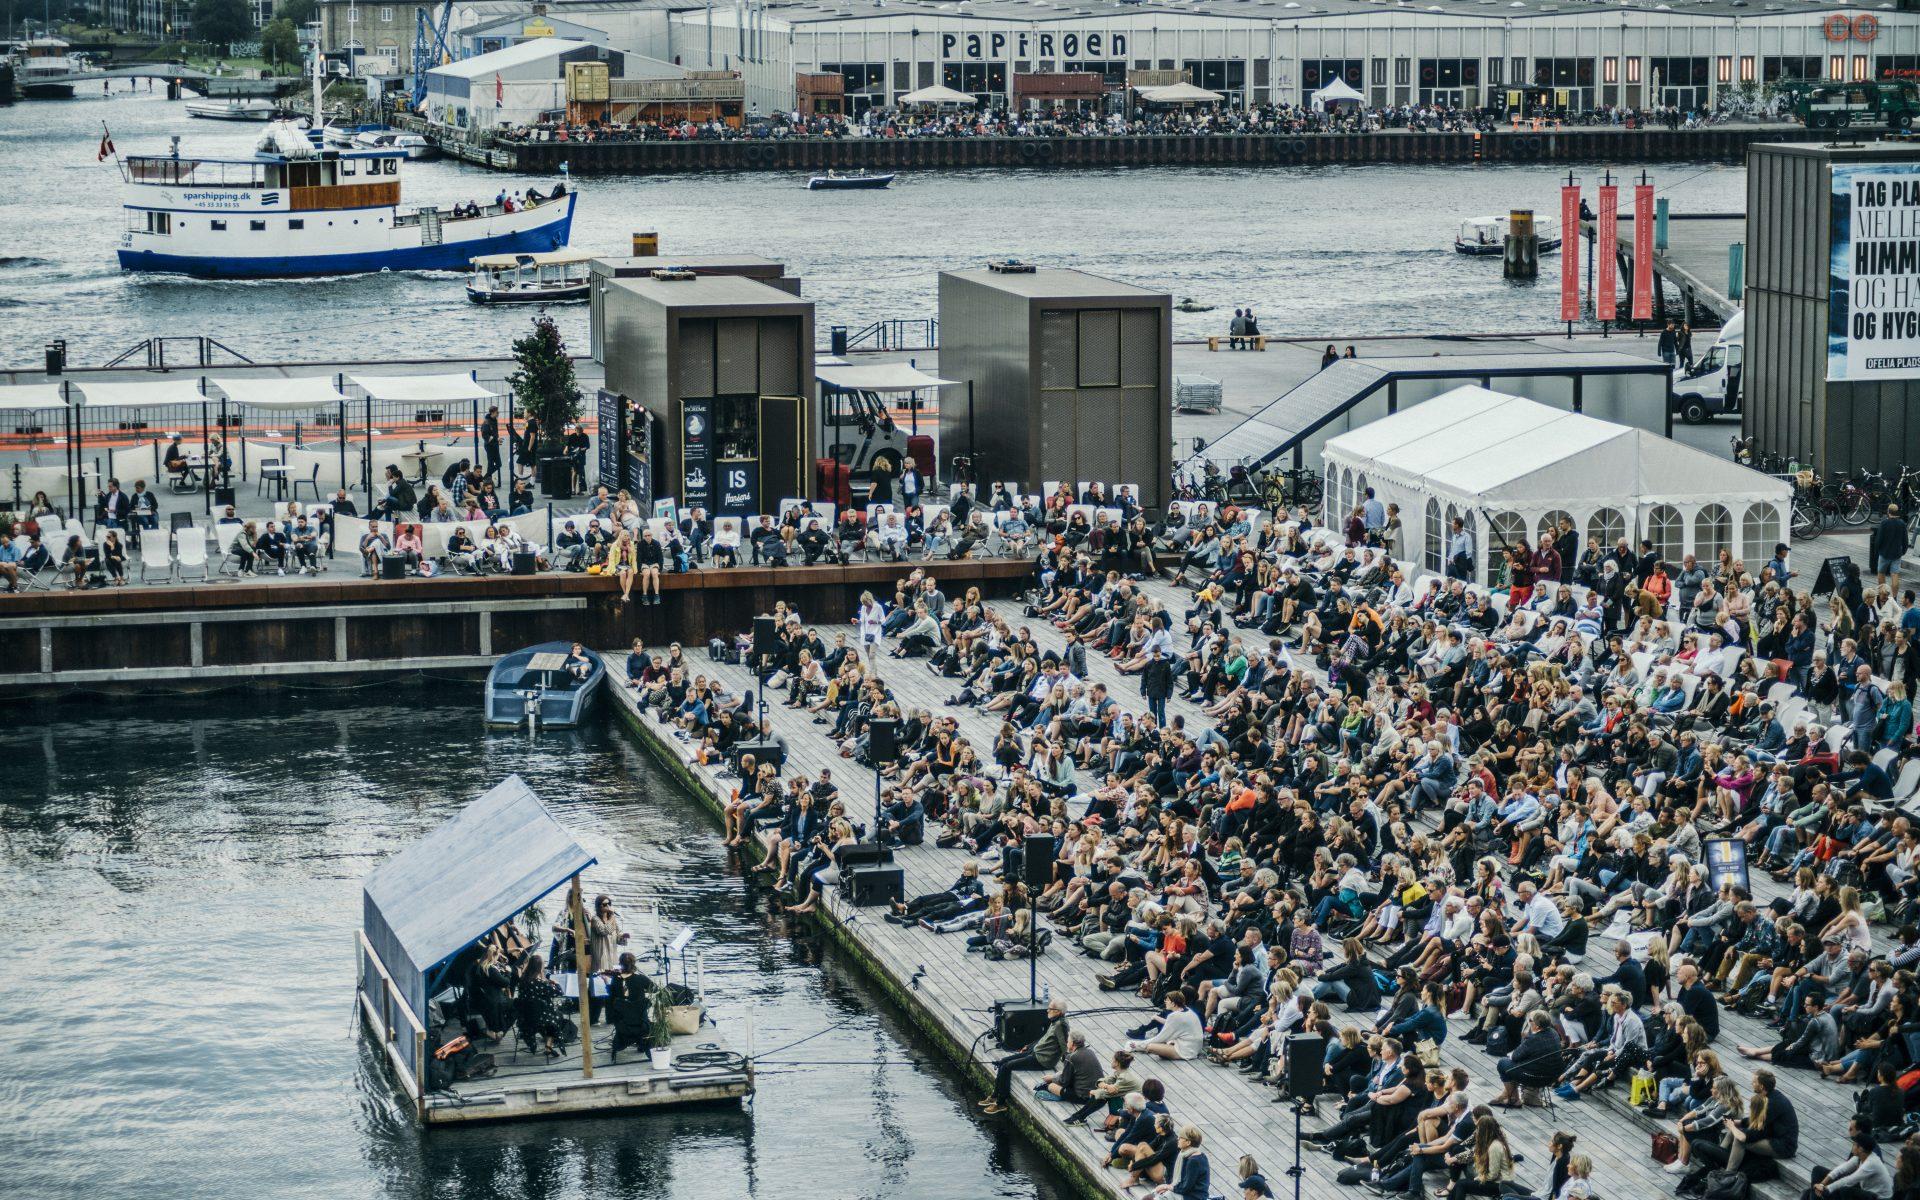 Pernille Rosendahl og strygerensemblet Who Killed Bambi spillede koncert på en flydende pram, mens publikum nød musikken fra Kyssetrappen ved Ofelia Plads.